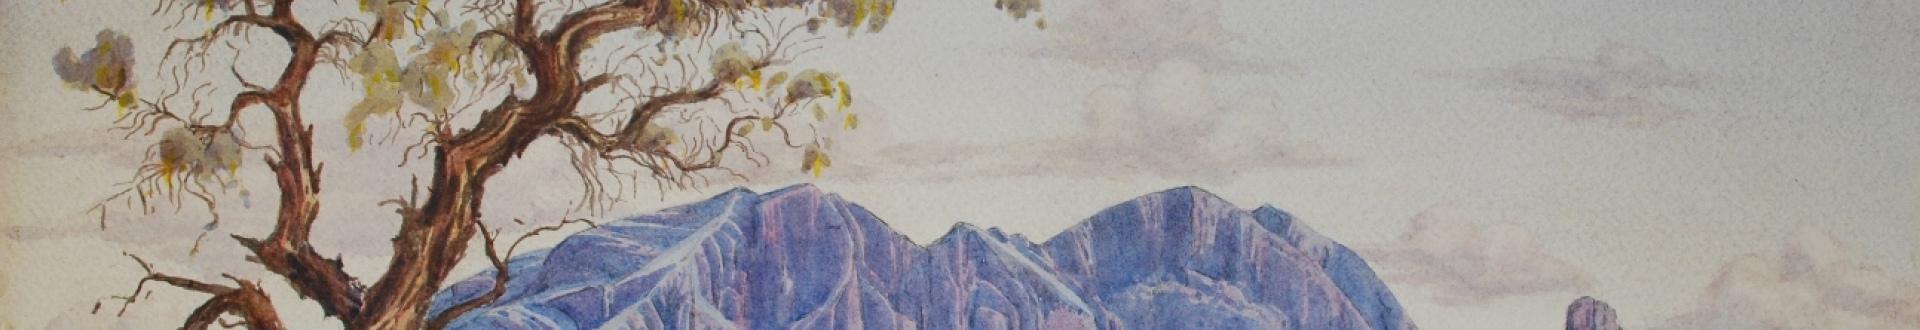 Albert Namatjira, Mount Sonder with Corkwood Tree